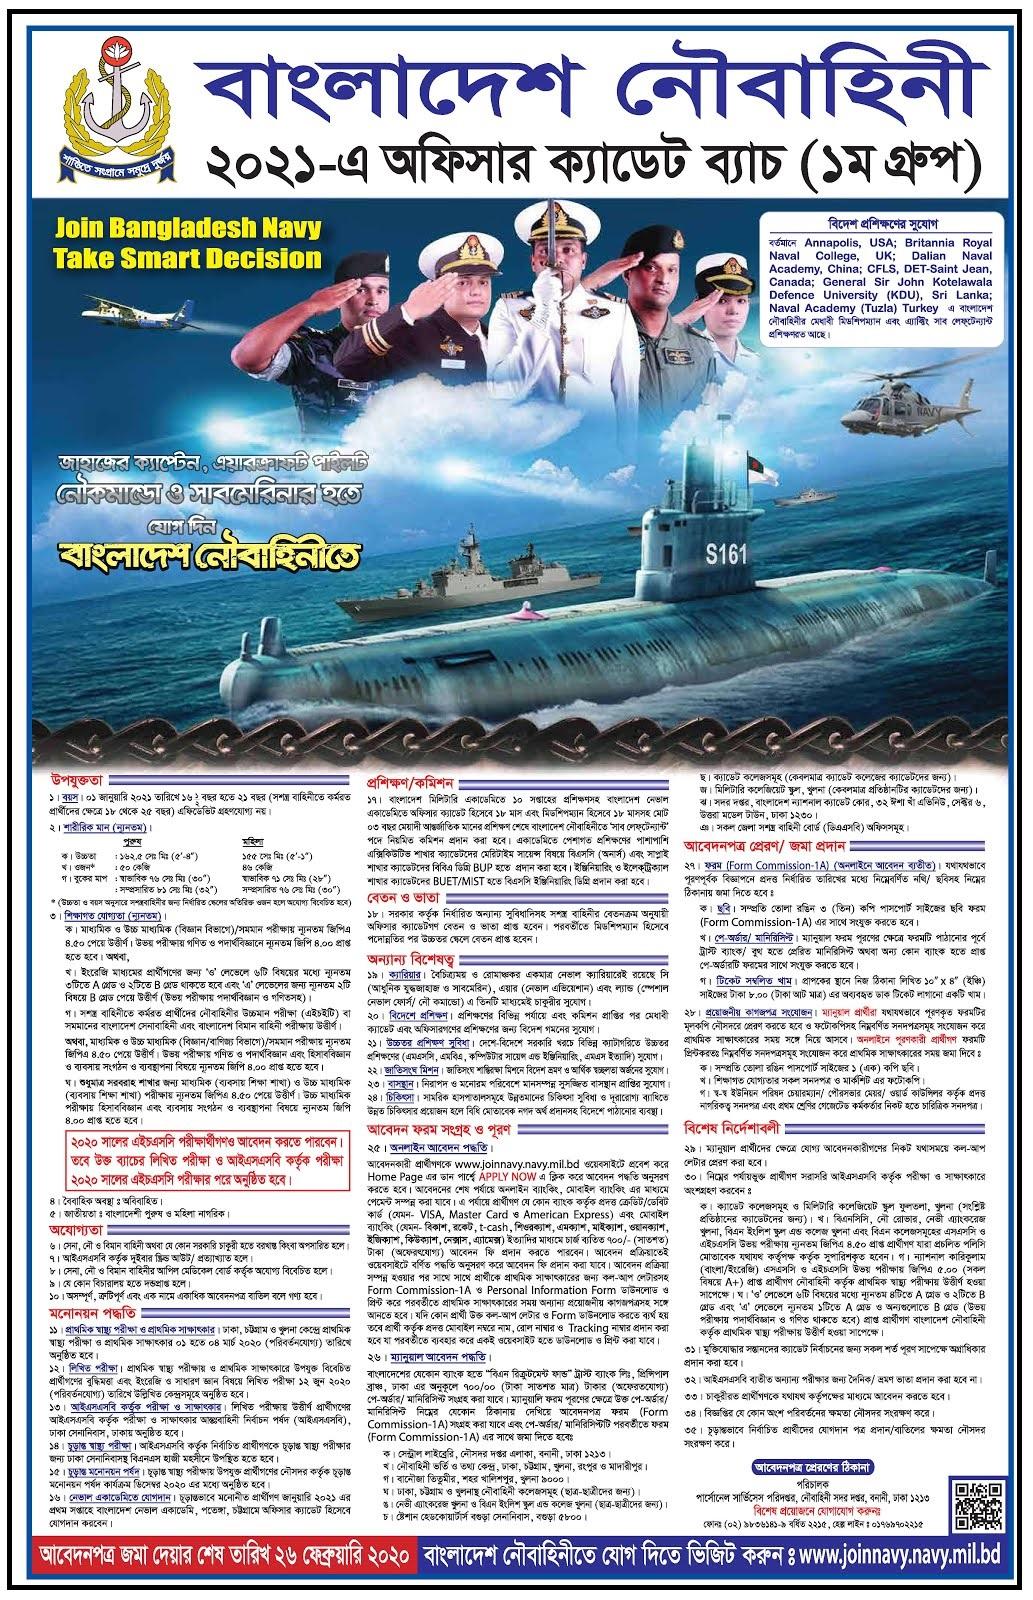 bangladesh navy sailor circular 2020,navy circular 2020,bd navy job circular 2019,navy circular 2019,bangladesh navy job circular 2019,bangladesh navy circular 2019,www navy mil bd jobs circular 2019,bangladesh navy circular 2020,